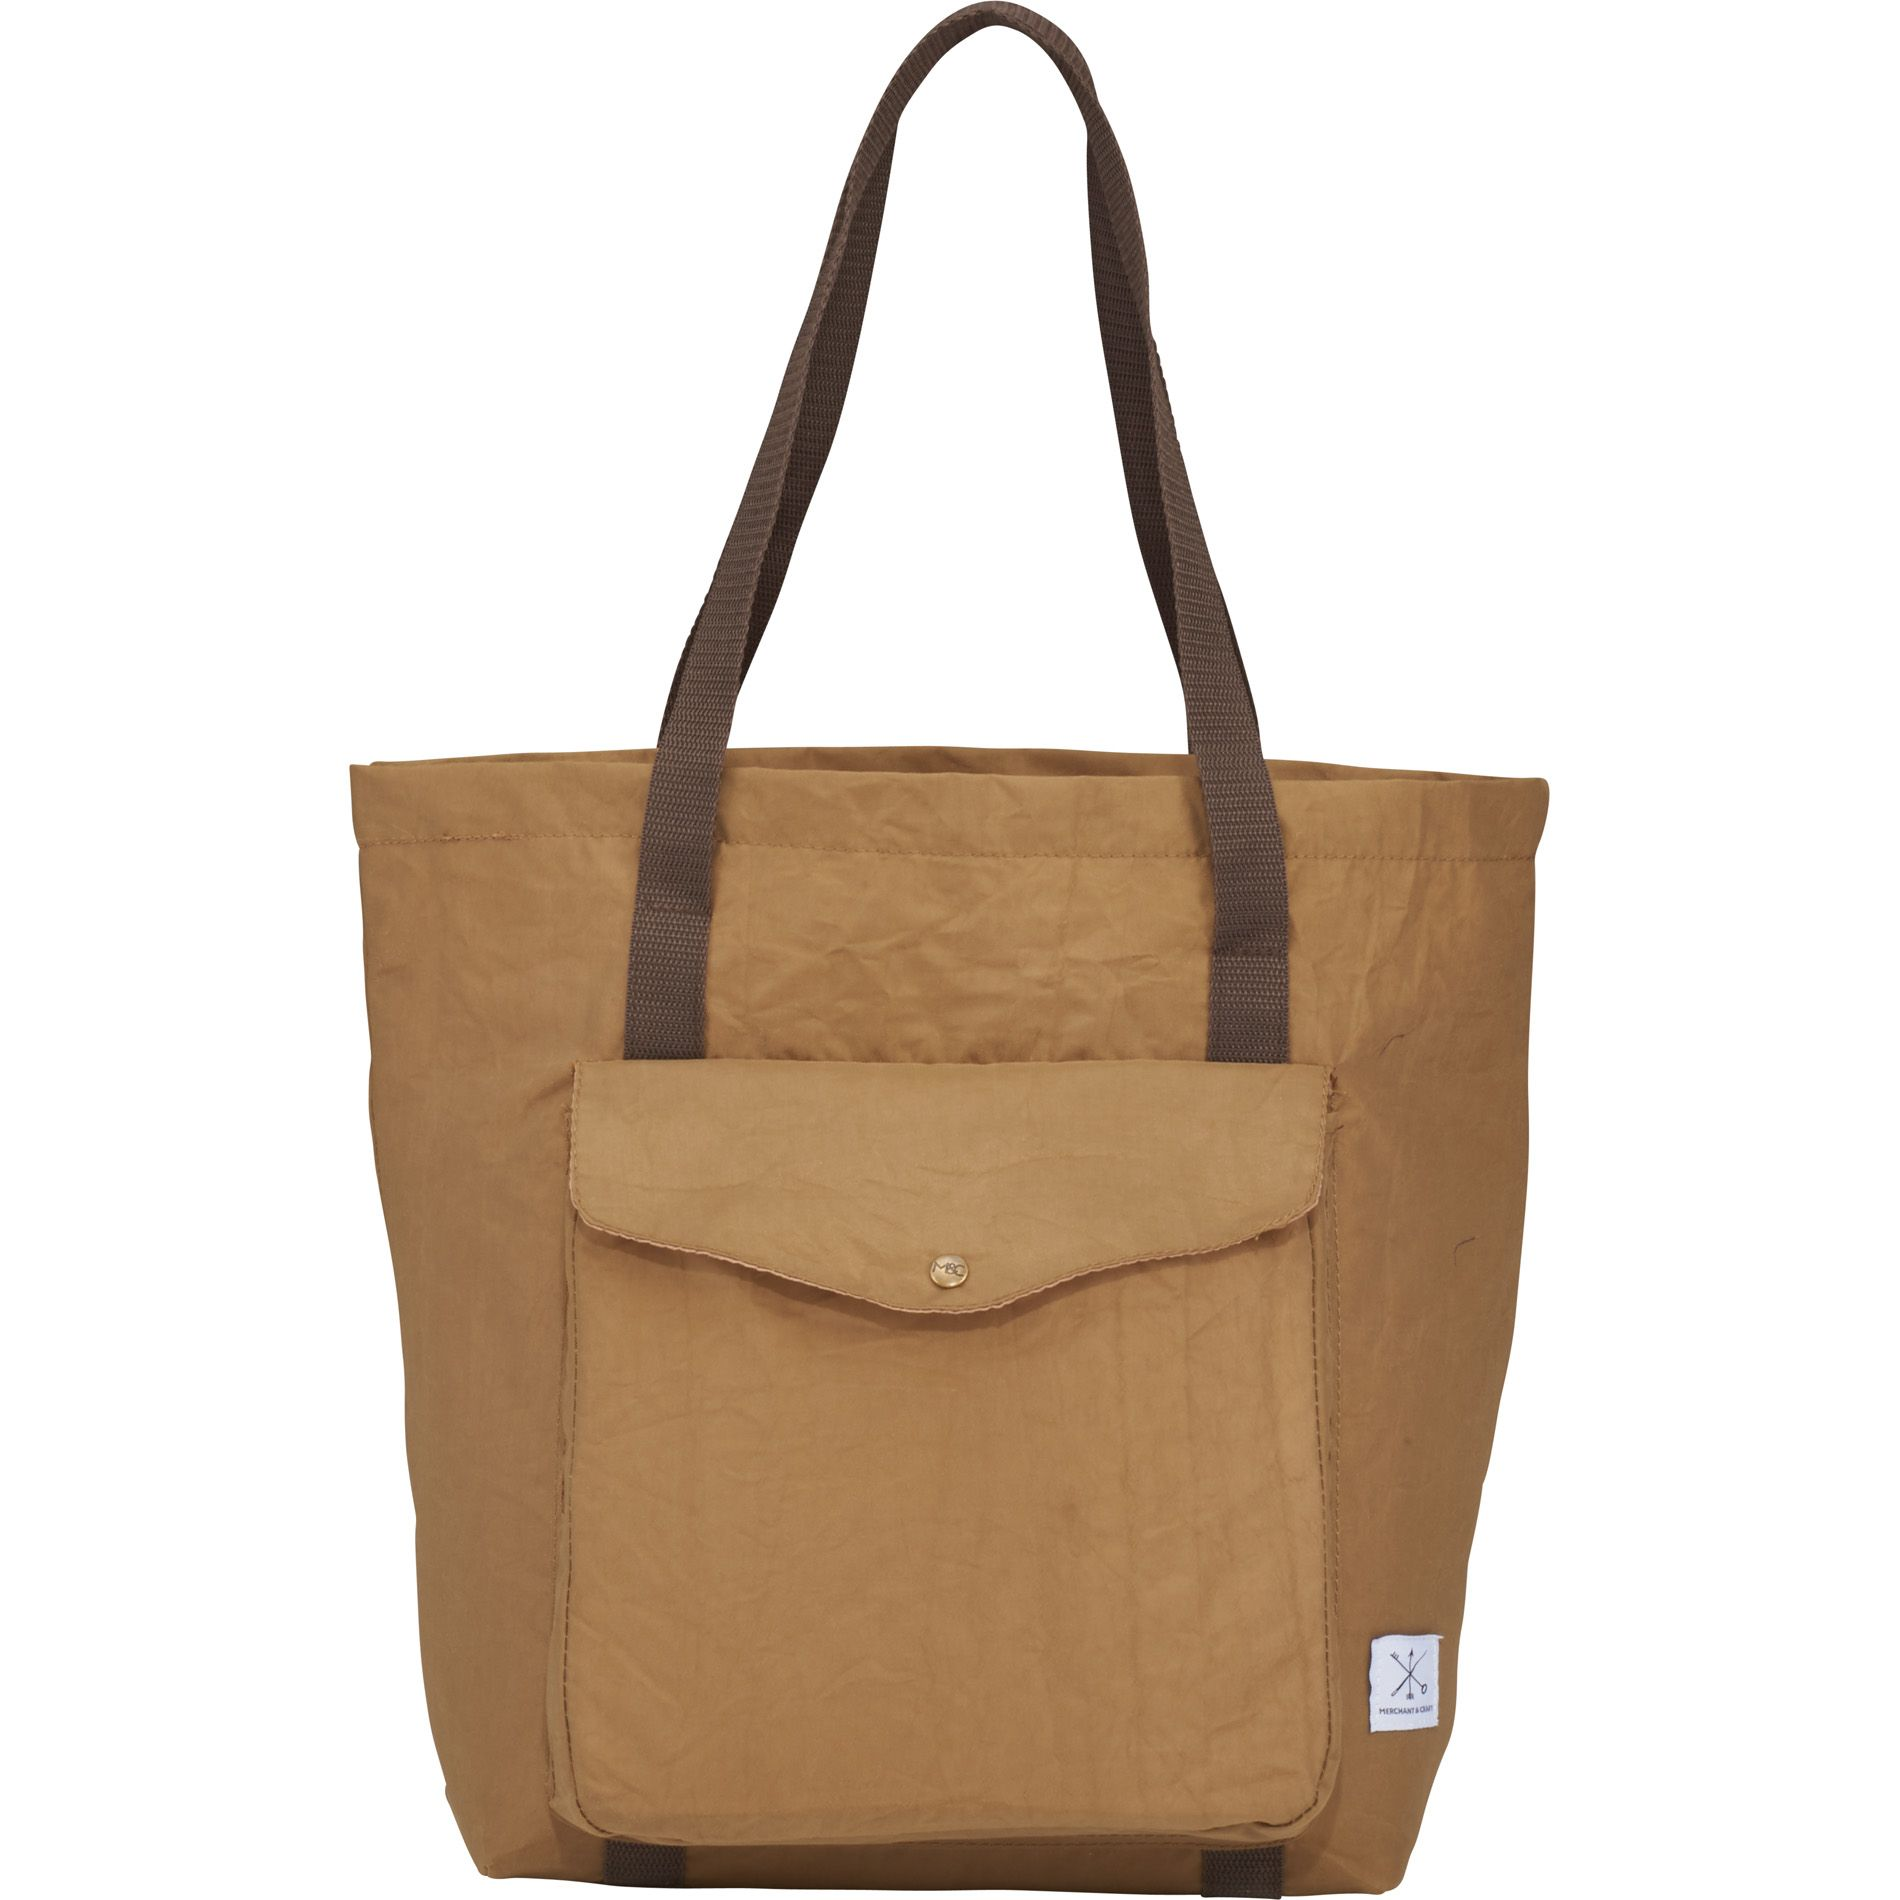 Valubag Womens Self-fabric Handles Tote Bag